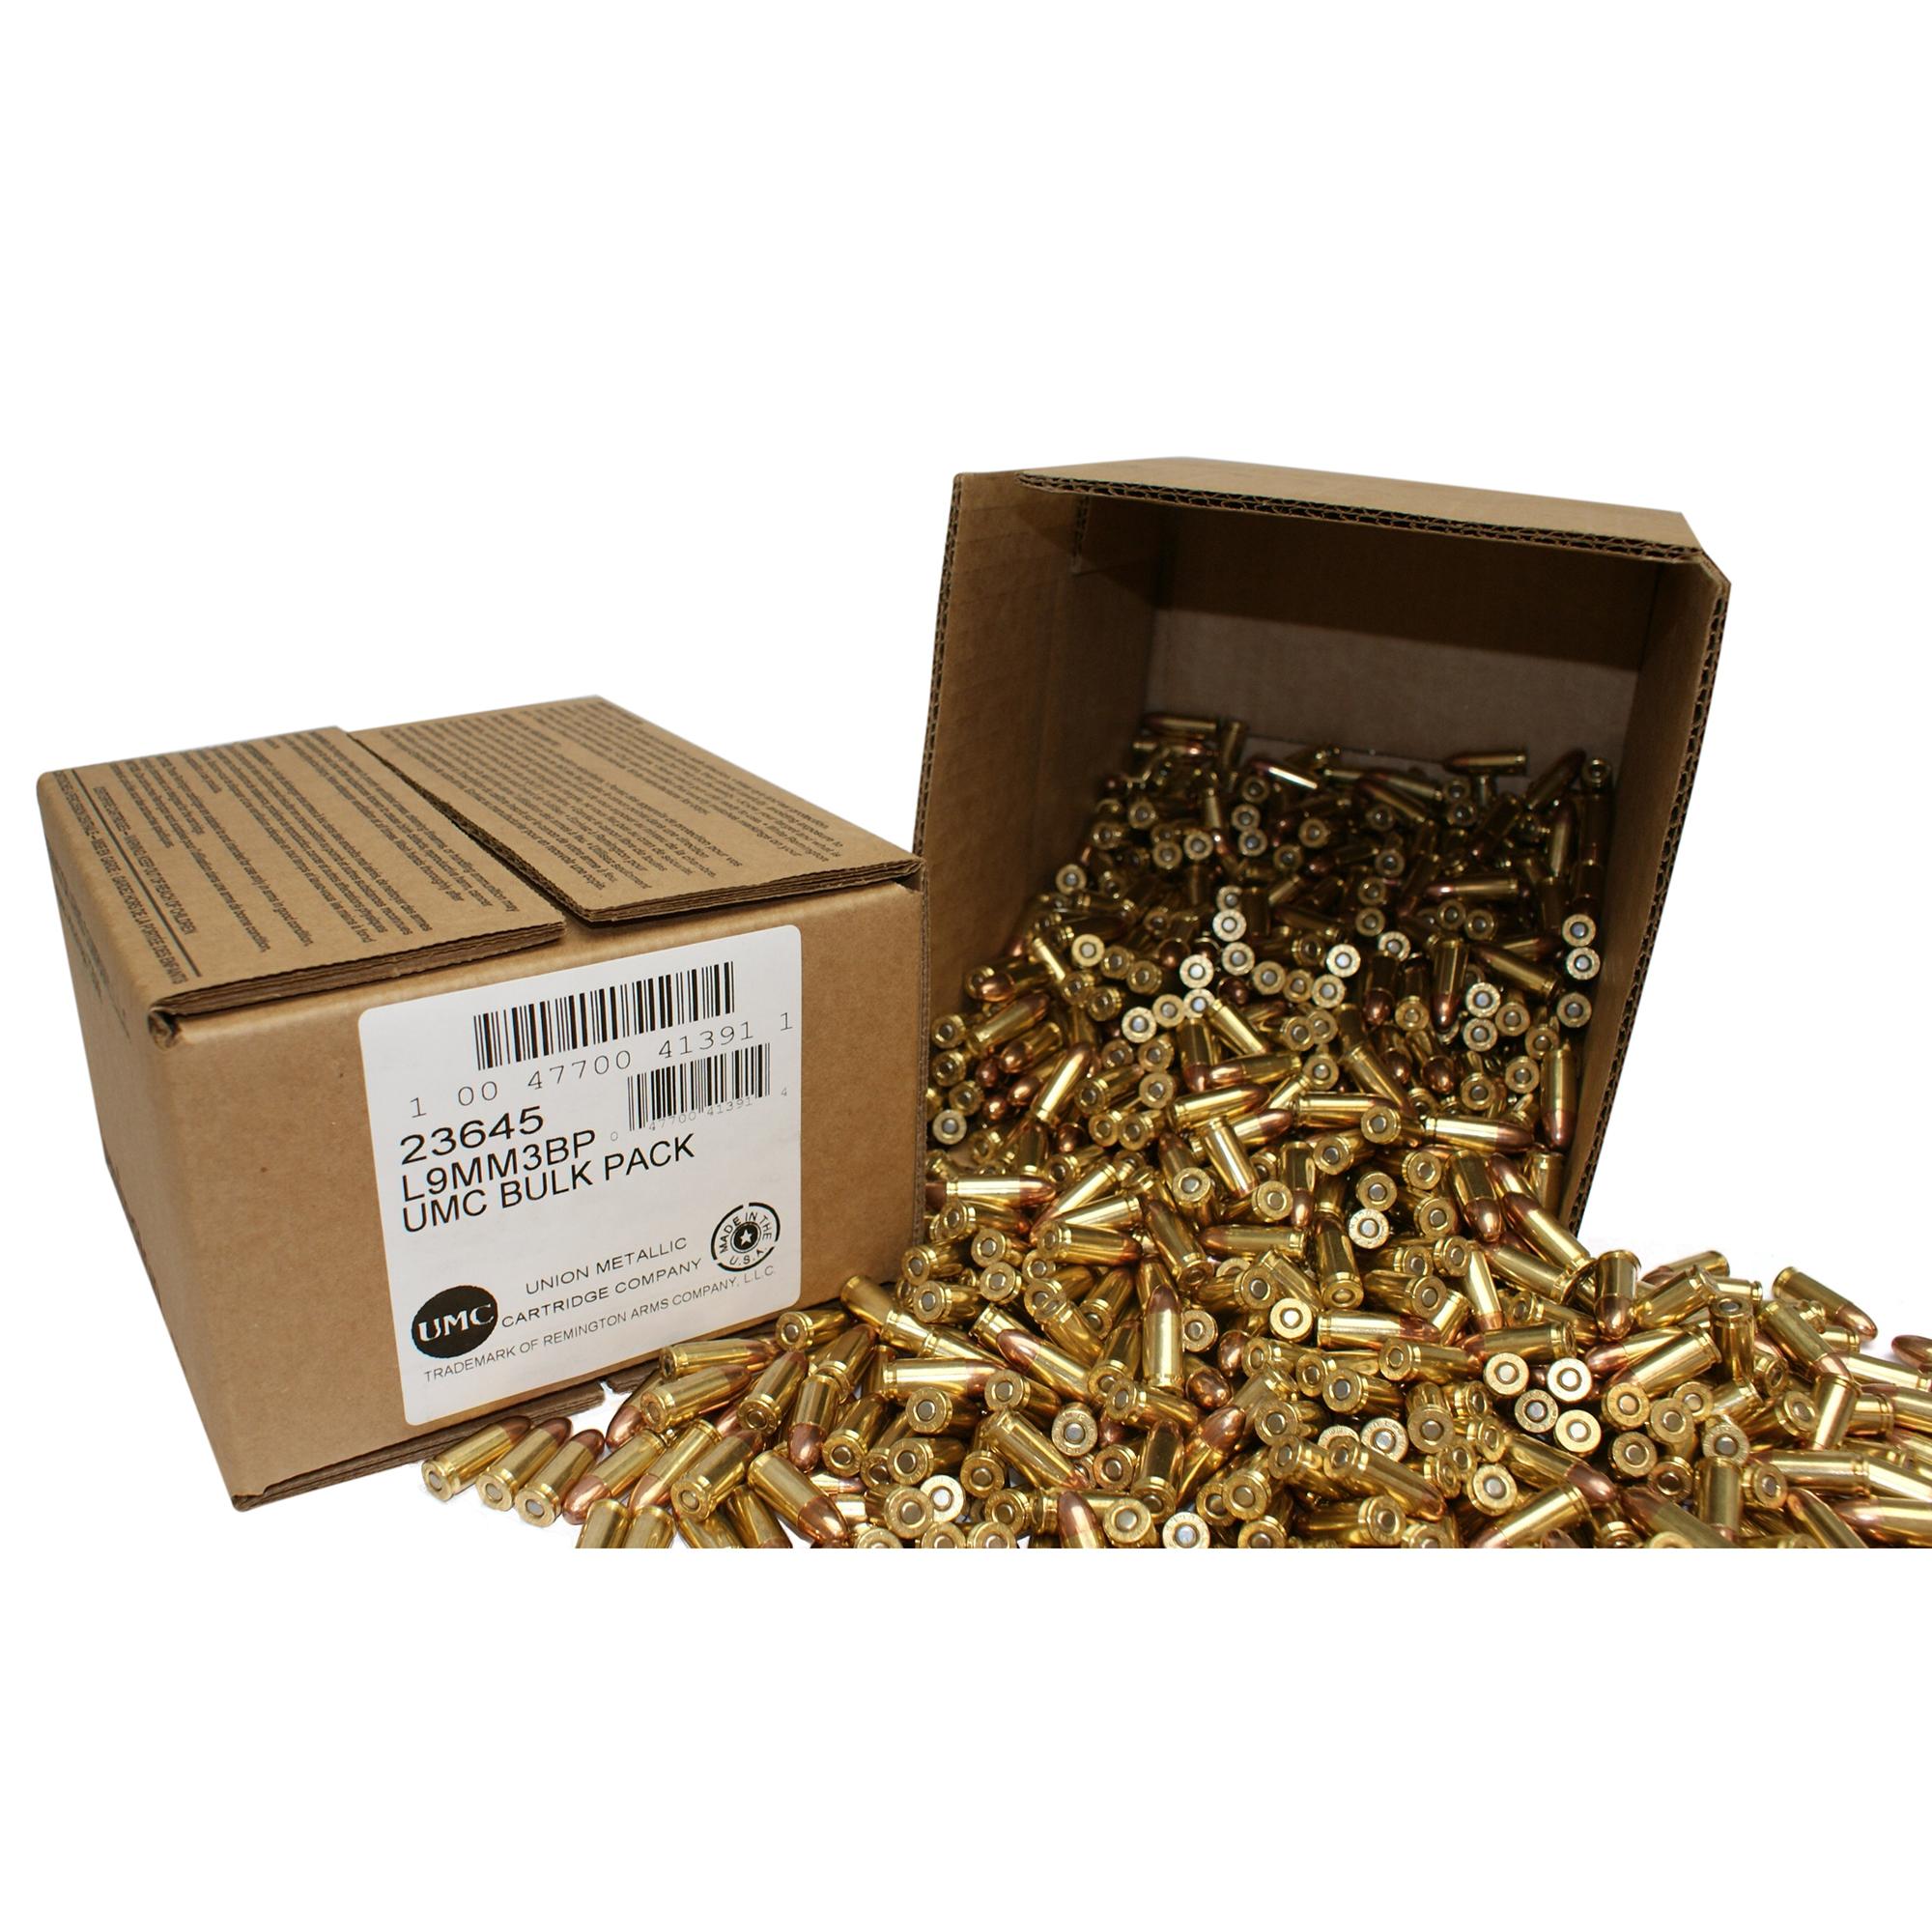 Remington UMC Handgun Ammo Bulk Box, .45 ACP, 230-gr, MC, 500 Rounds